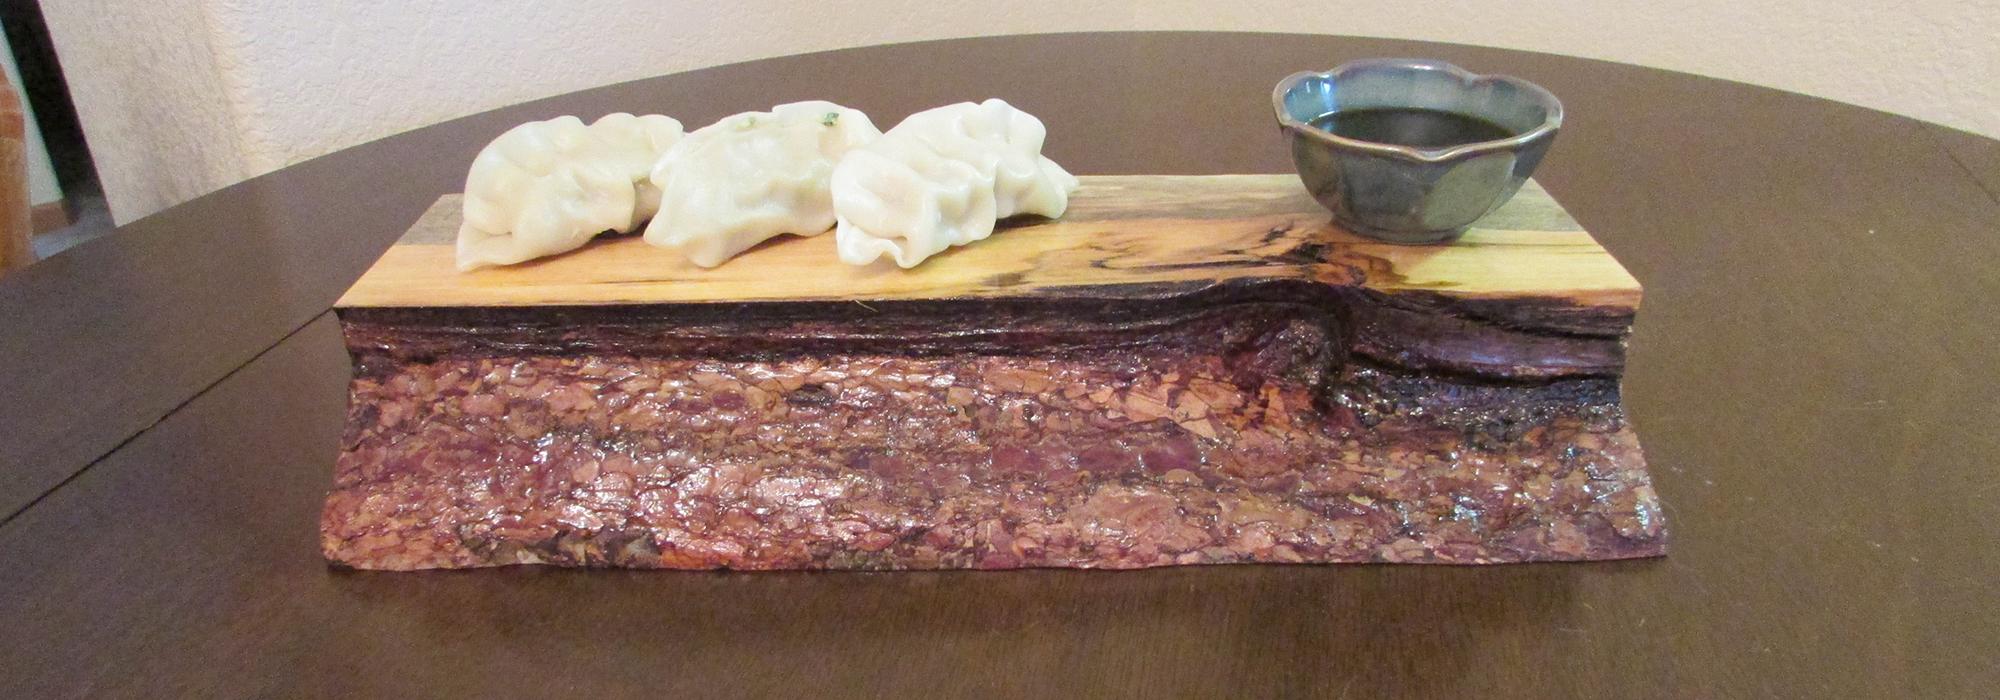 wooden sushi board